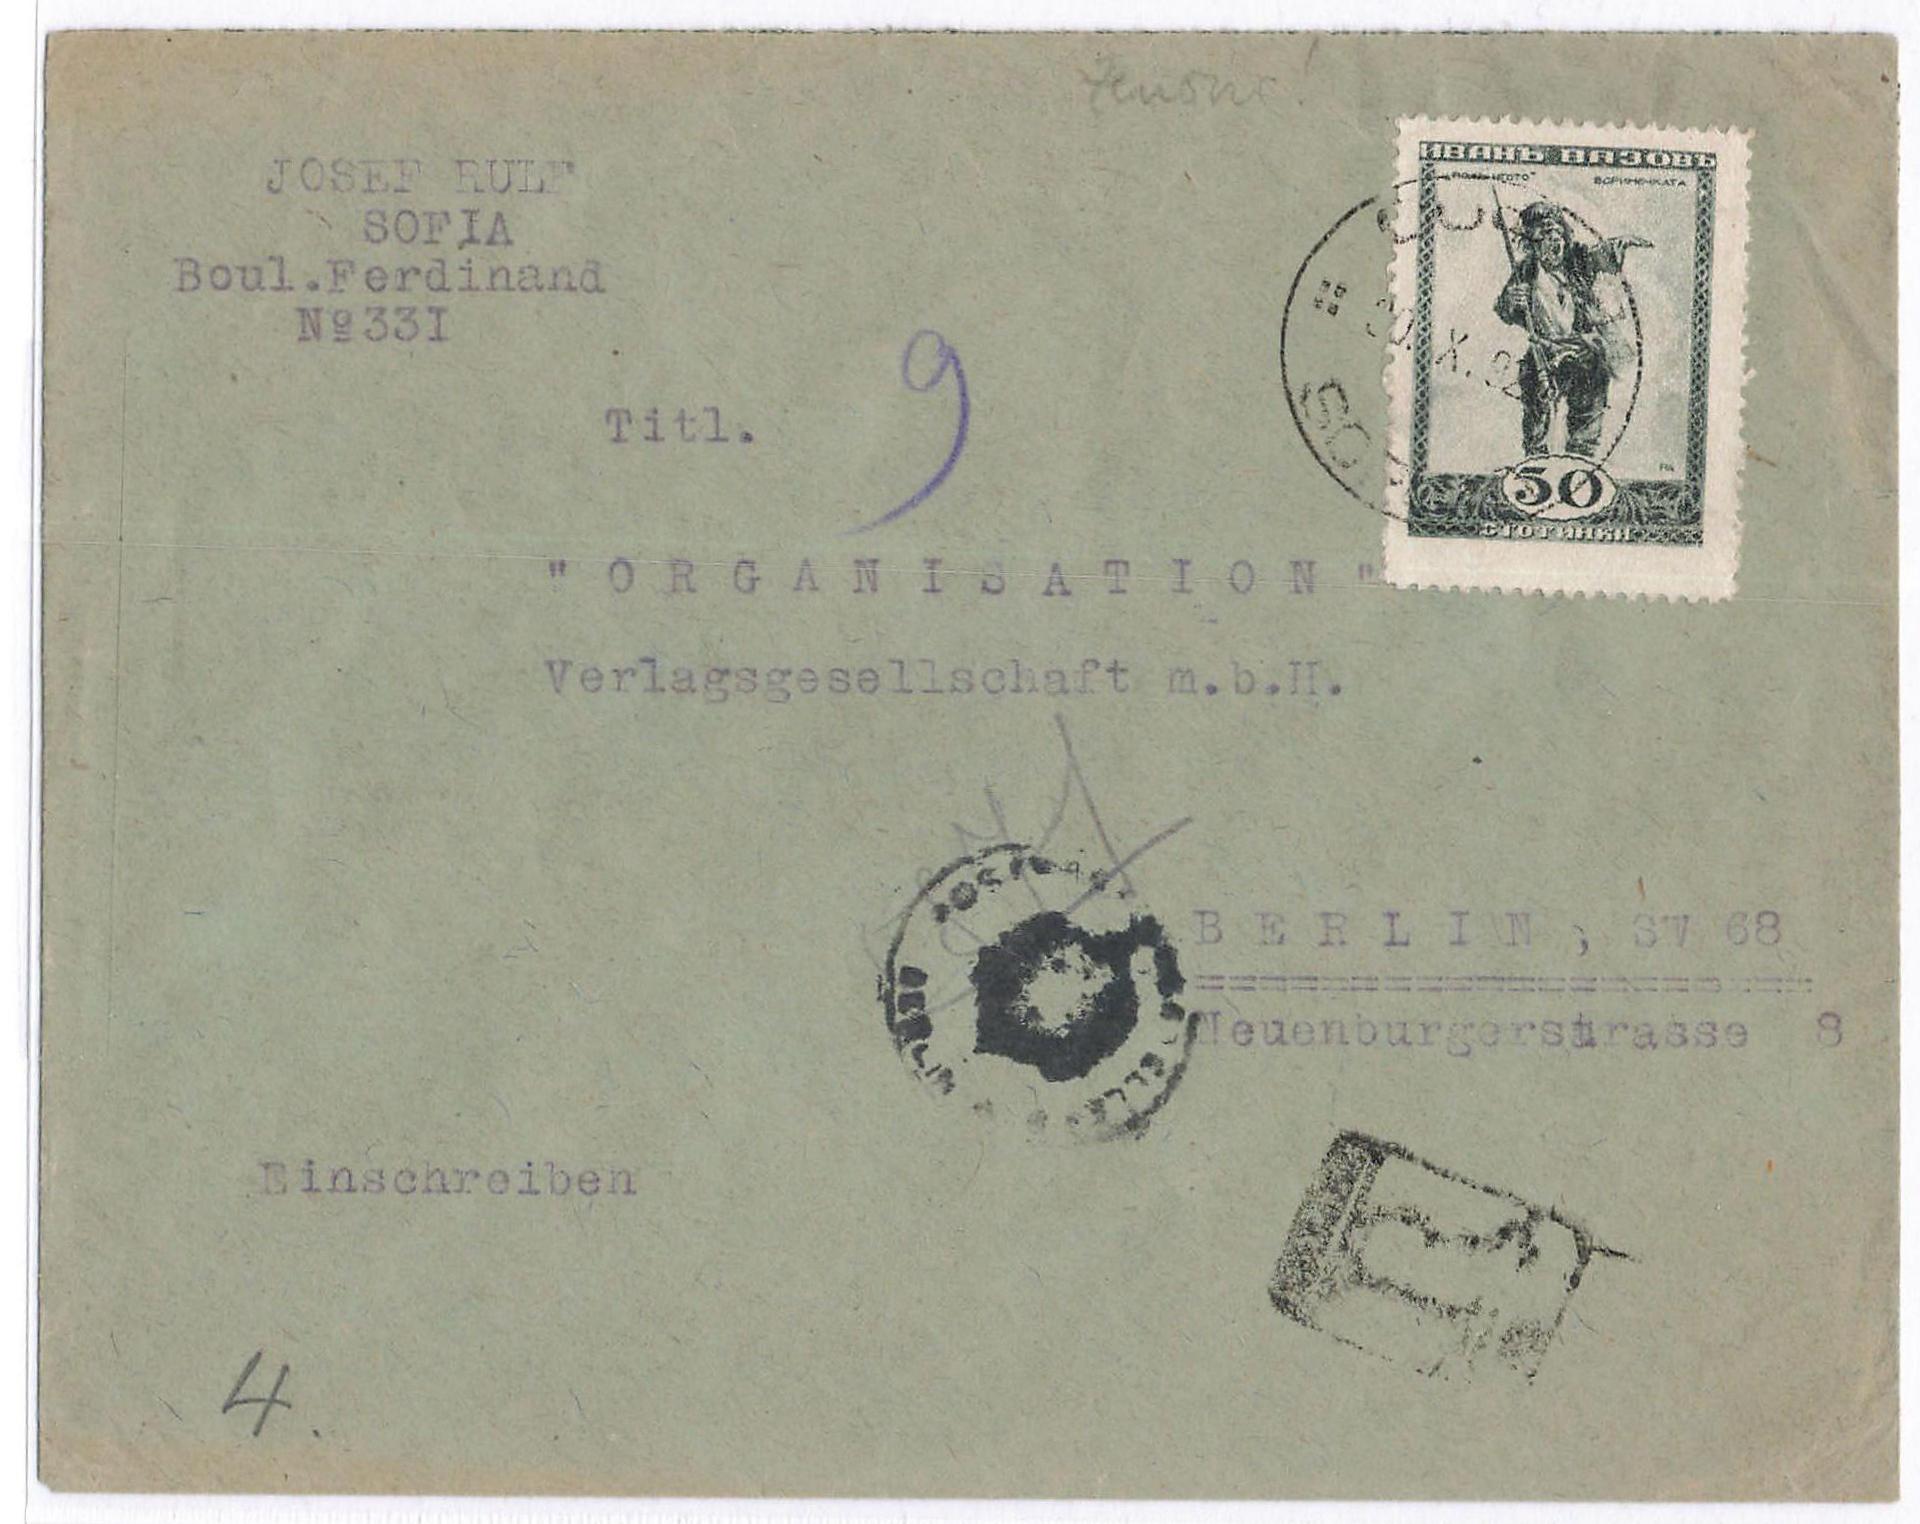 Lot 17 - europa bulgarien -  Peter Harlos Auctions 42. Harlos Auktion